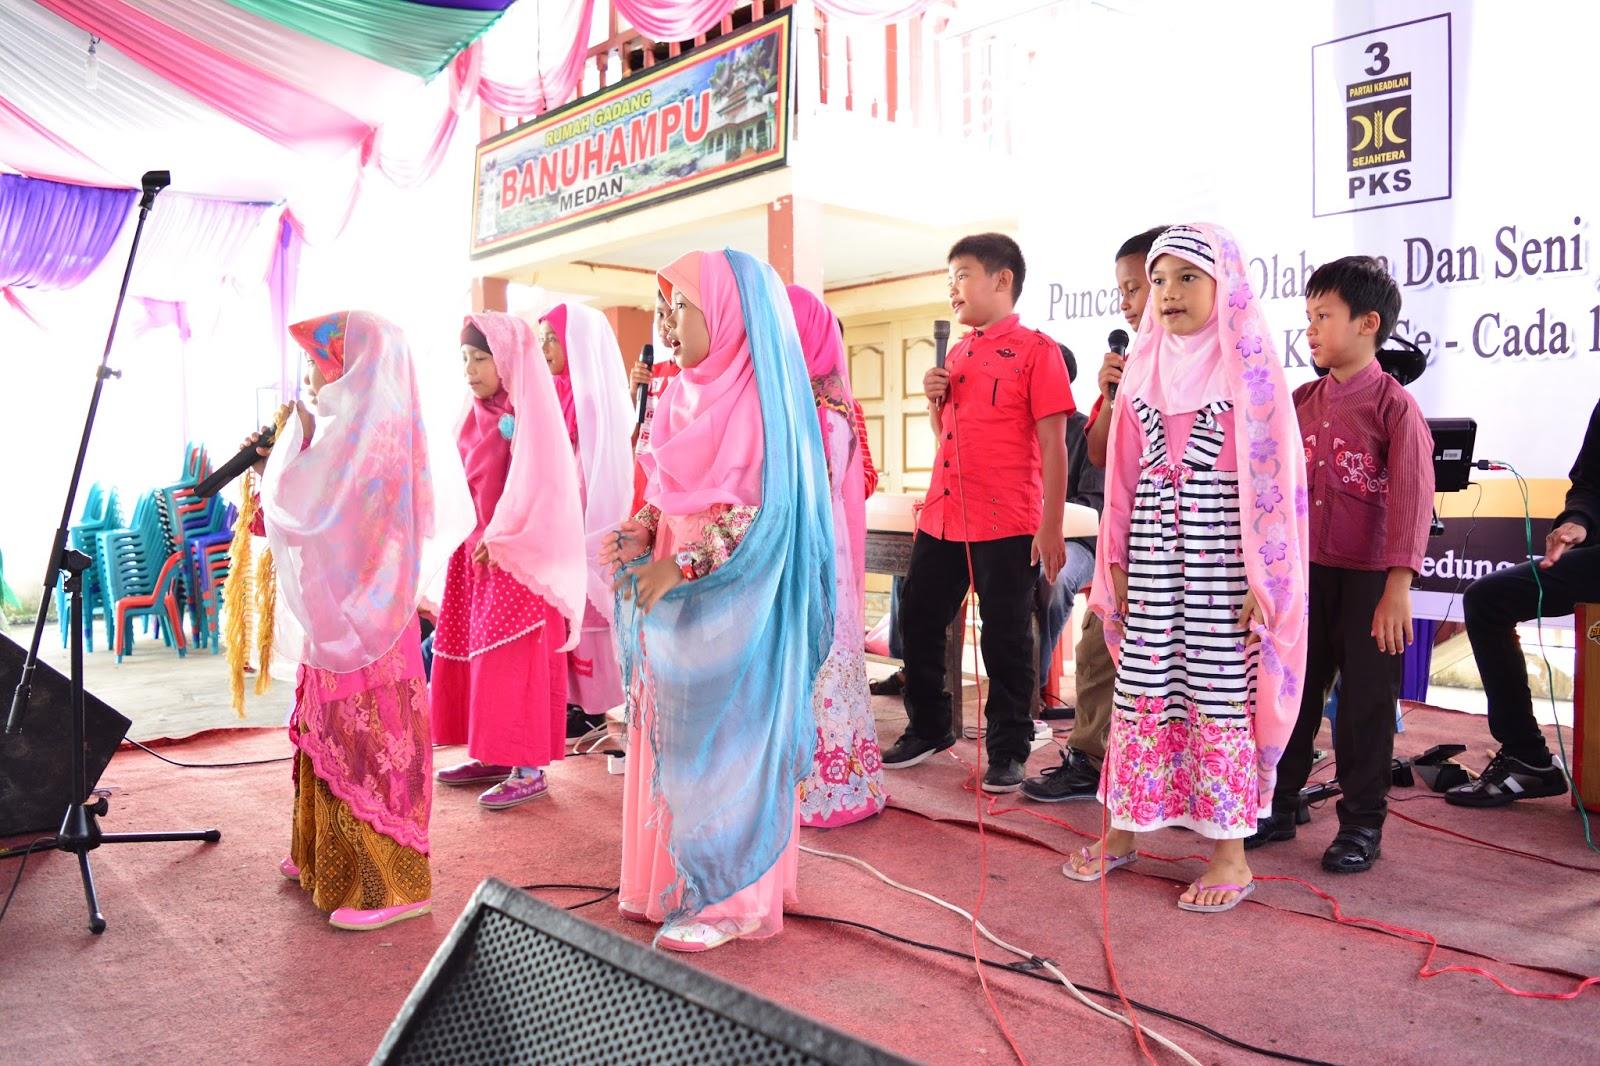 Atraksi Anak Kader Ramaikan Acara Puncak Porseni Pks Kota Medan